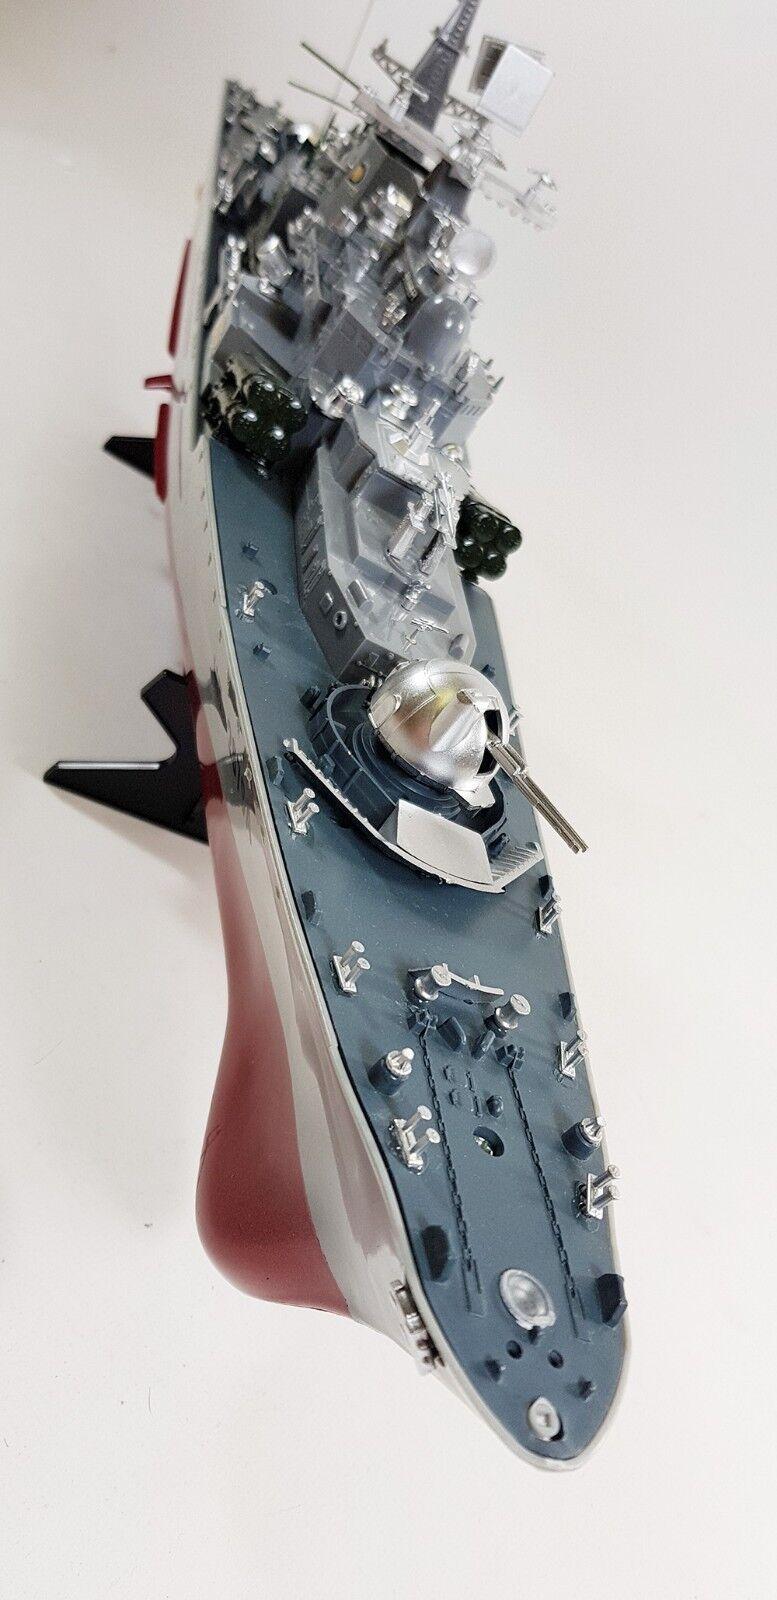 Nuclear Radio Control Rc Modelo Destroyer Navy Marine War Batalla Bote RTR World